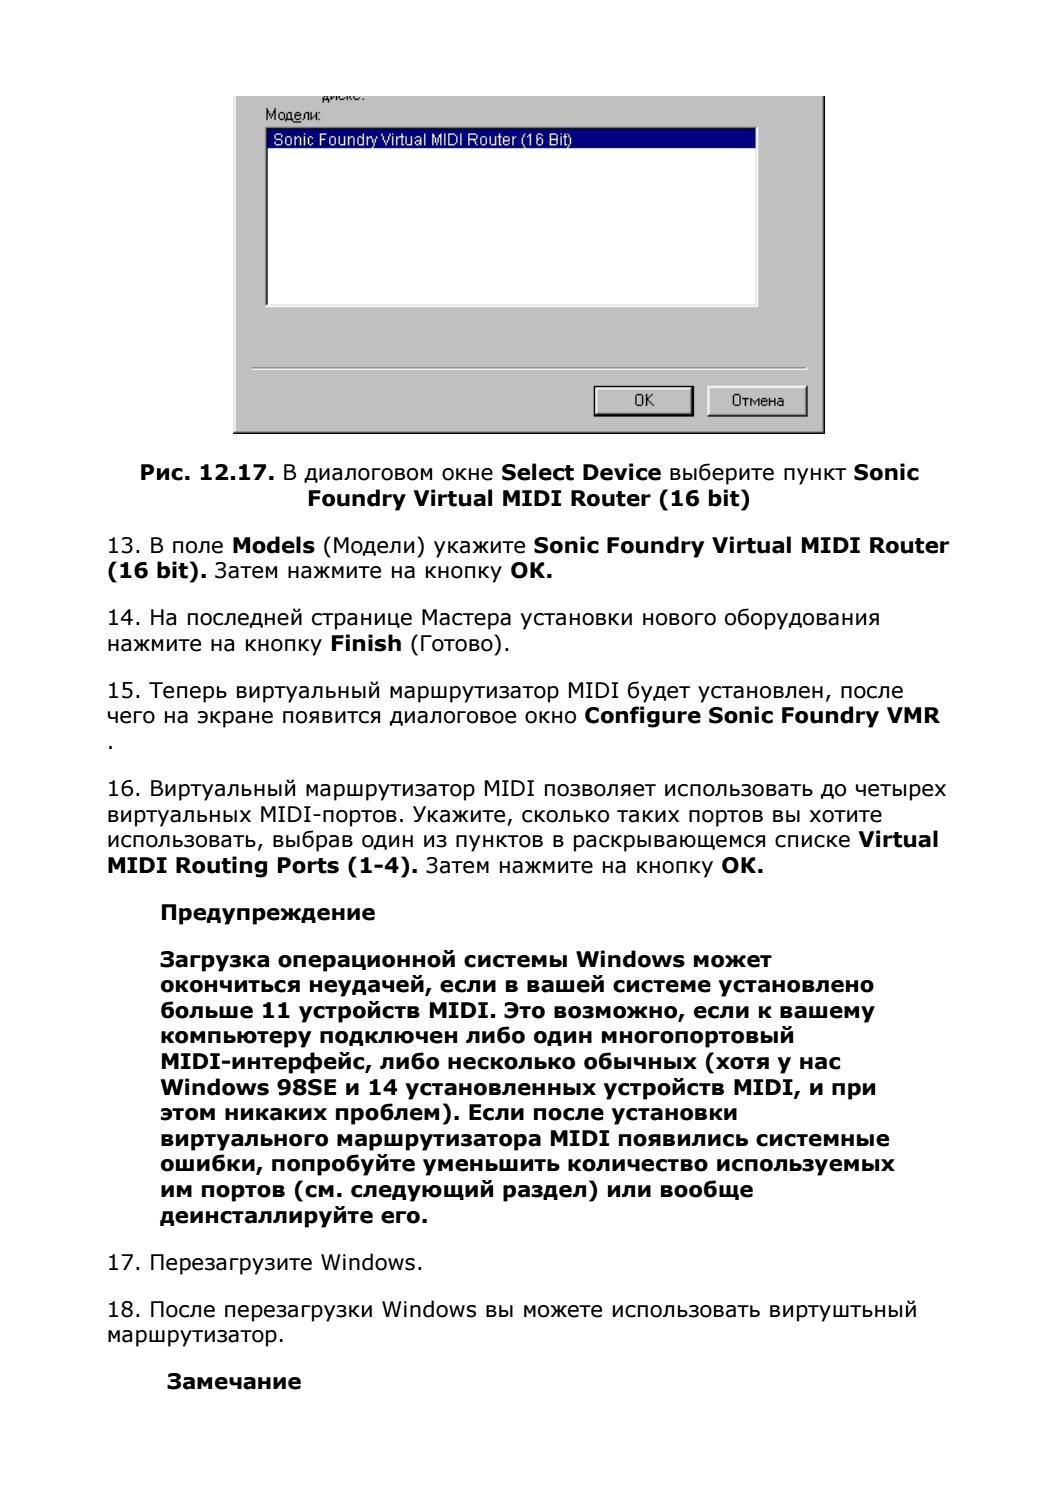 Sonic Foundry Virtual MIDI Router Windows 7 Скачать